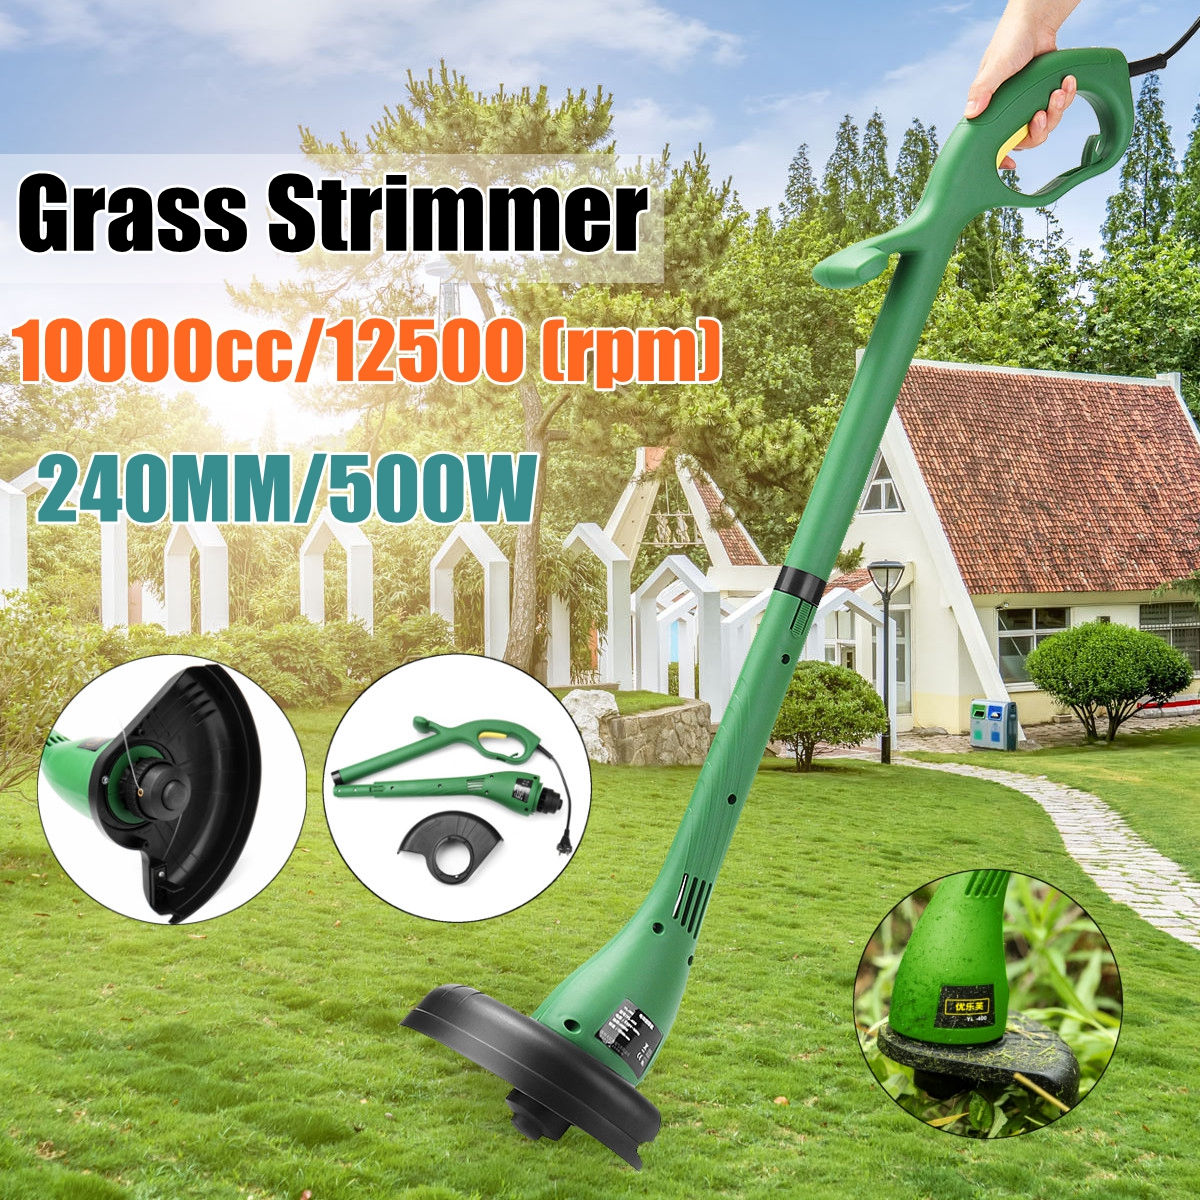 Home Electric Lawn Mower GT-320 Portable Garden Lawn Mower Weeding Machine 500W 12500 rpm/min Courtyard Pruning Tools цена